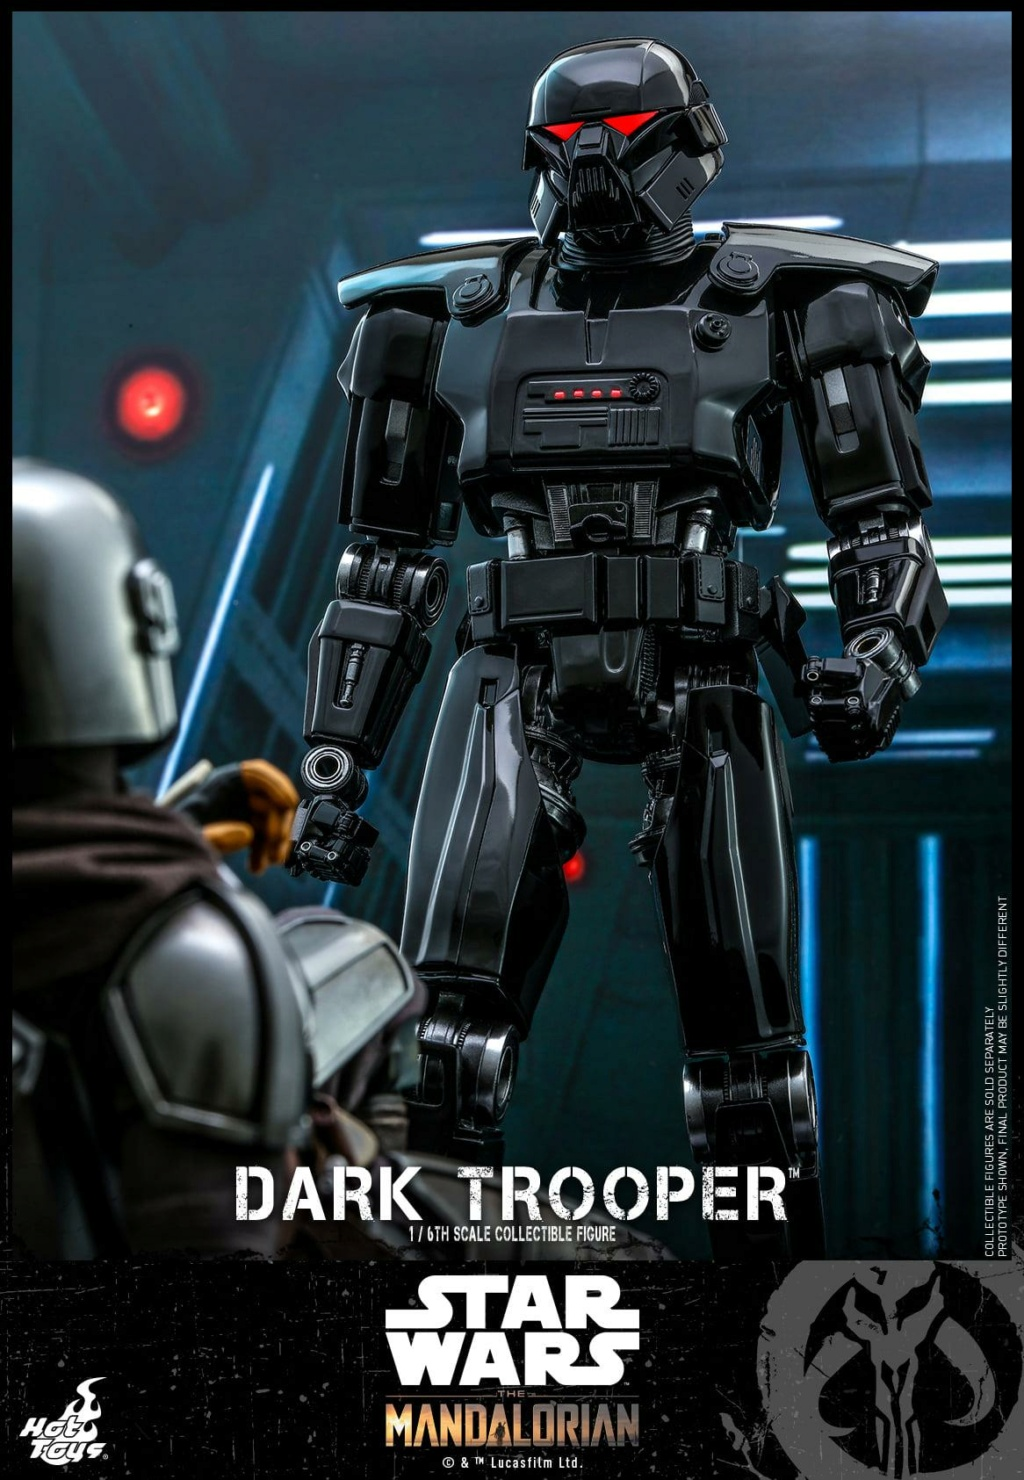 Dark Trooper Collectible Figure - 1/6th scale - Hot Toys Dark_t15